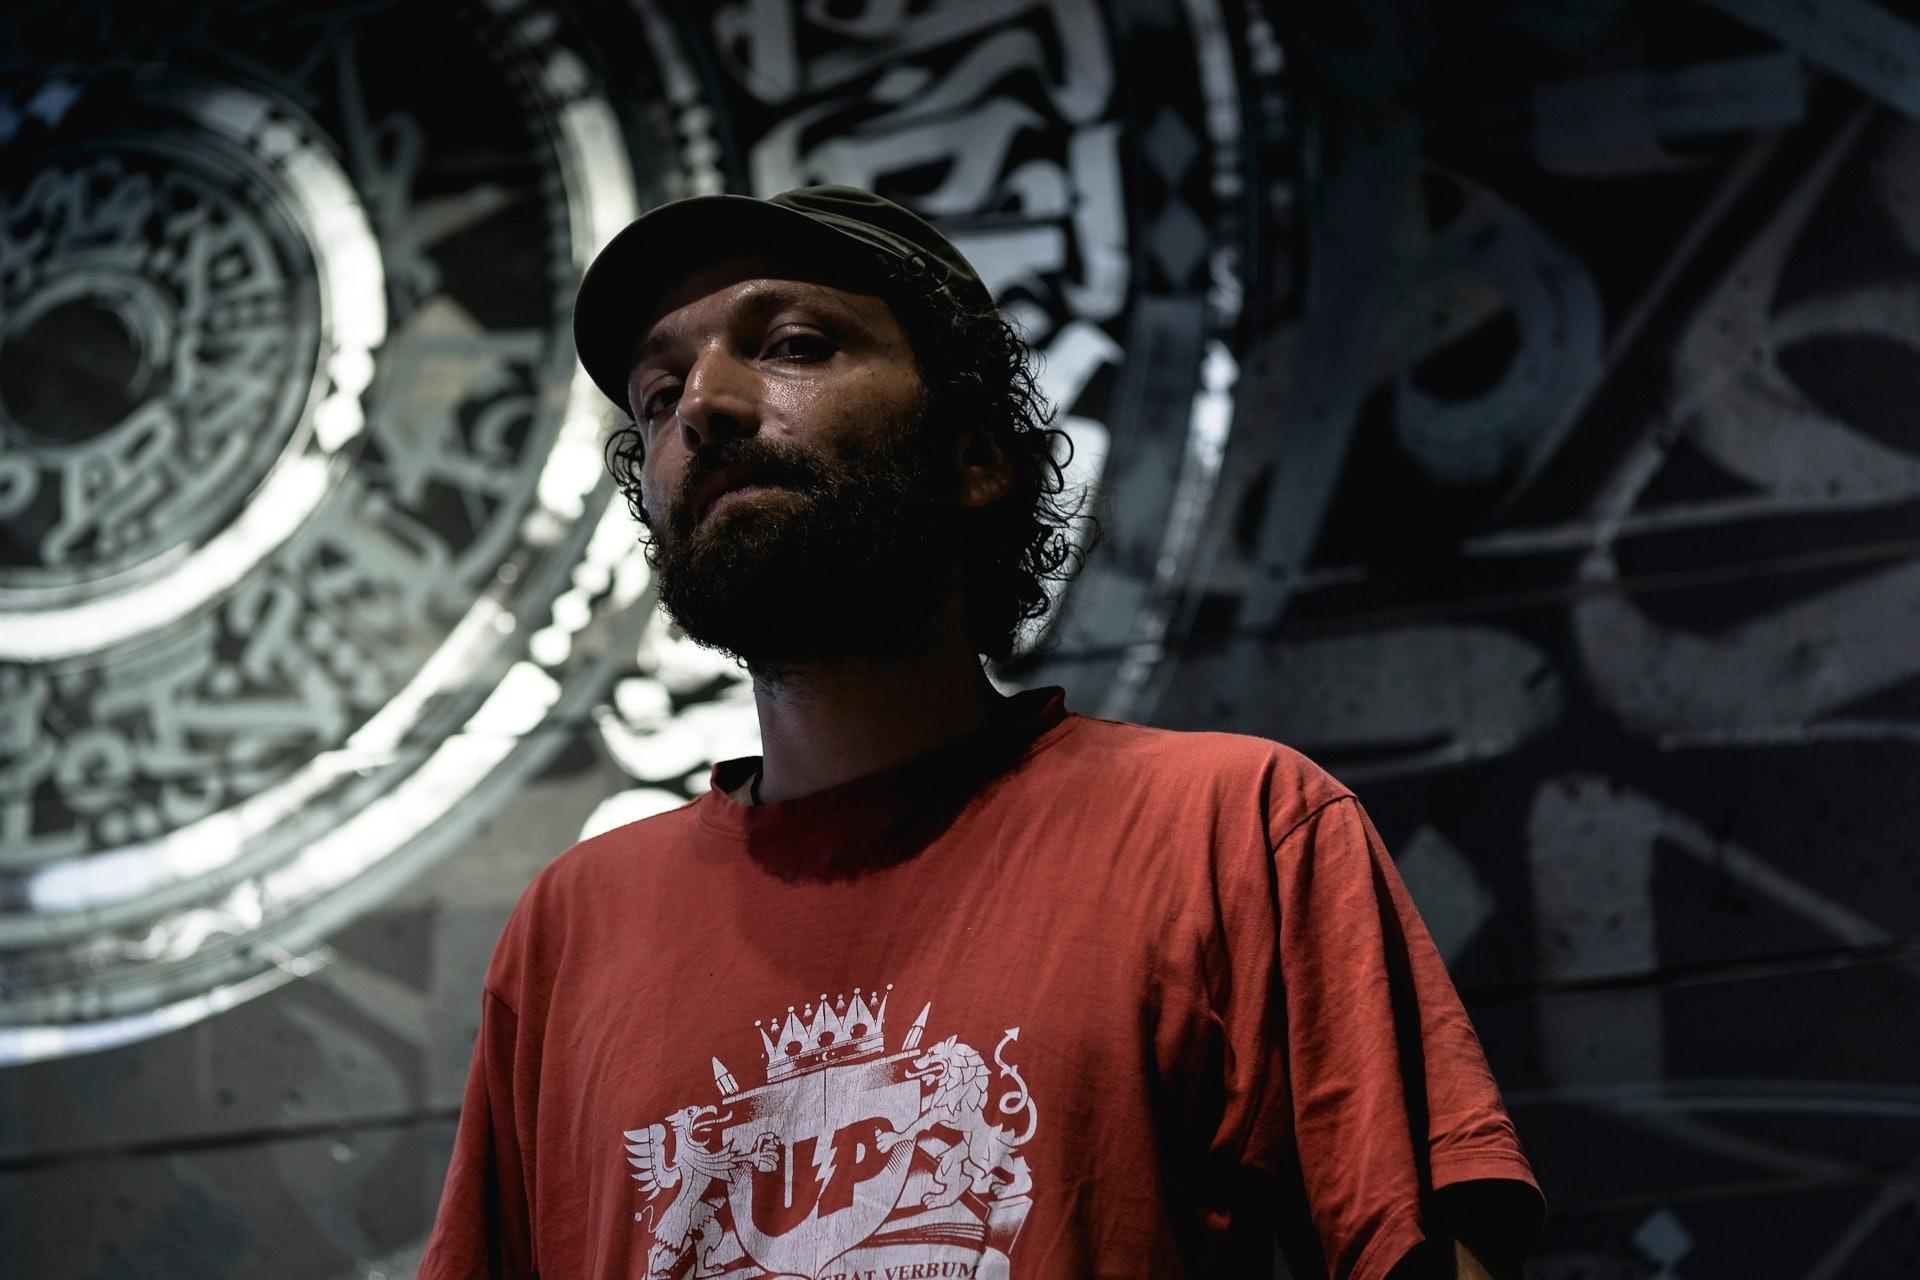 Streetart-Künstler Engin Dogan